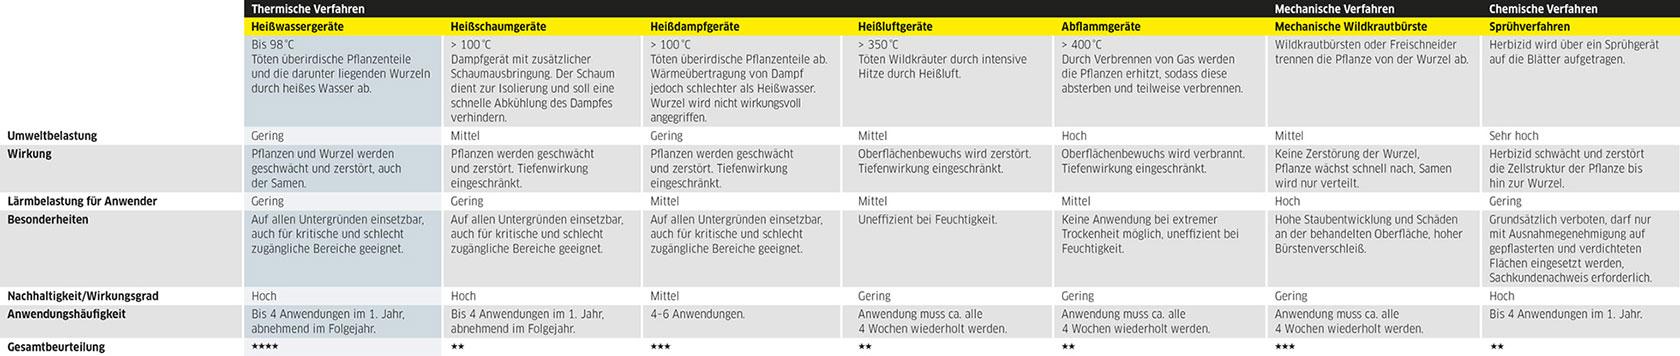 Matech_GmbH_Kärcher_Übersicht_Verfahren_Wildkrautbekämpfung